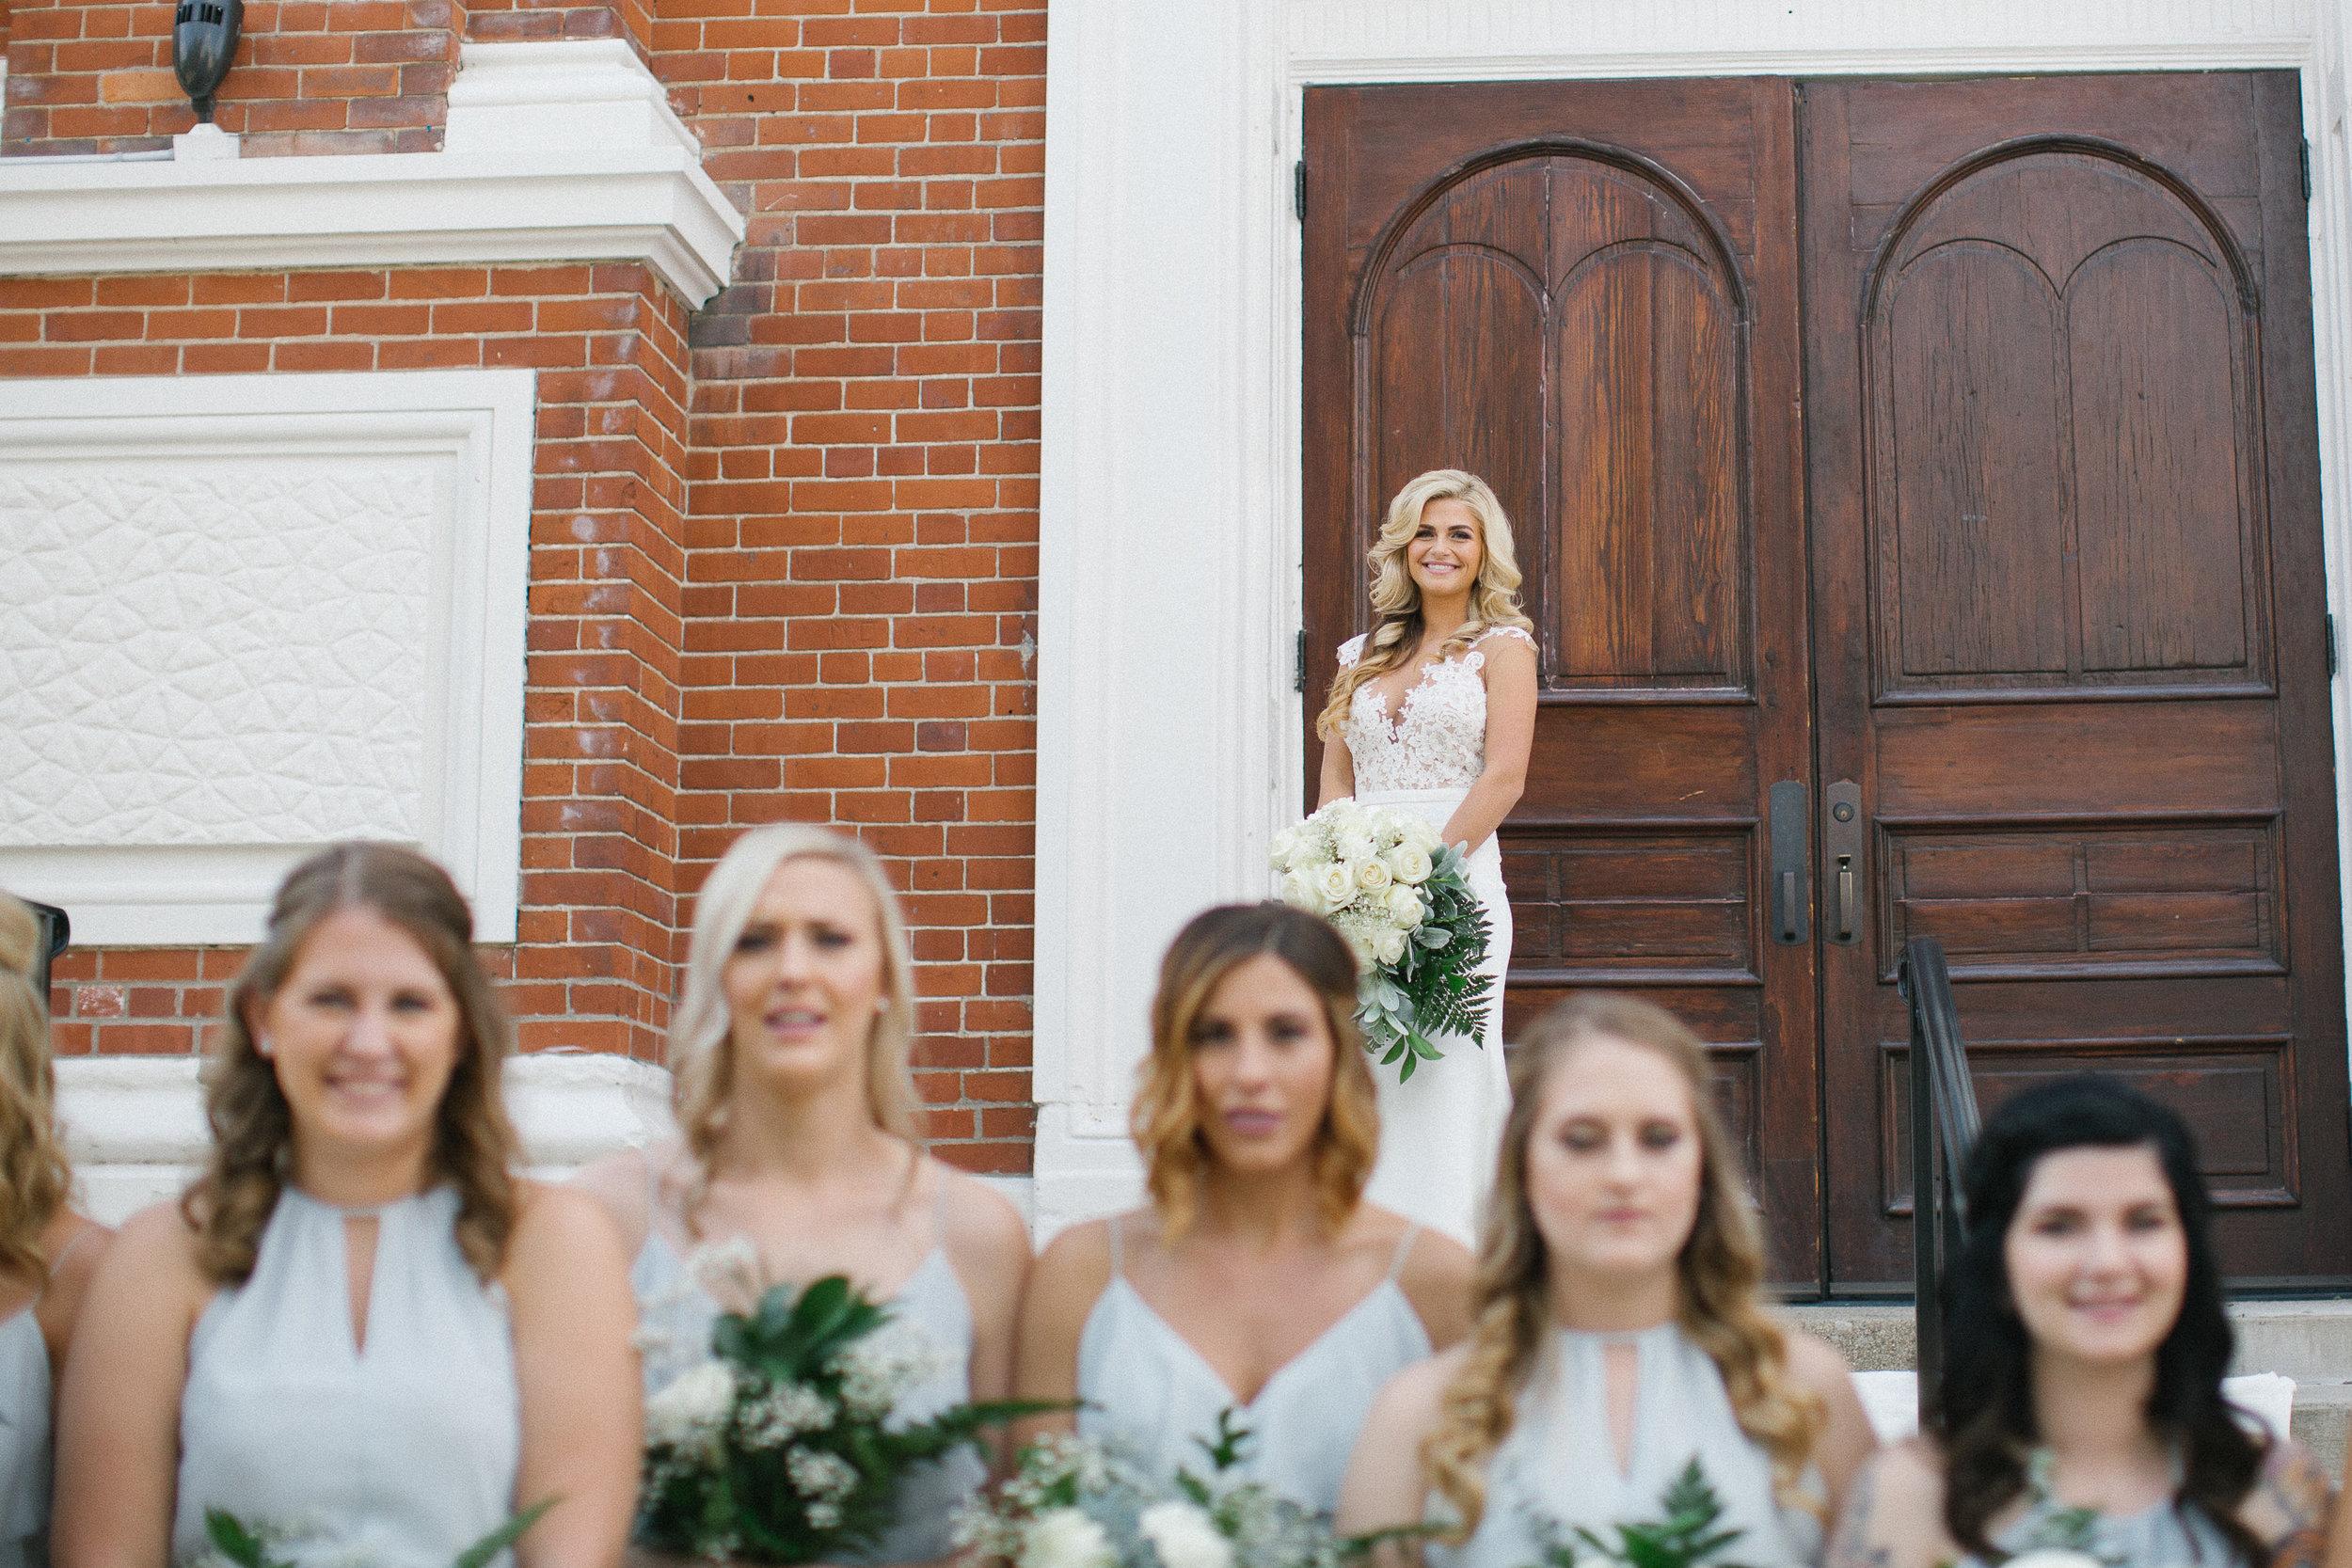 0100_20170819 Randi and Chance Wedding.jpg